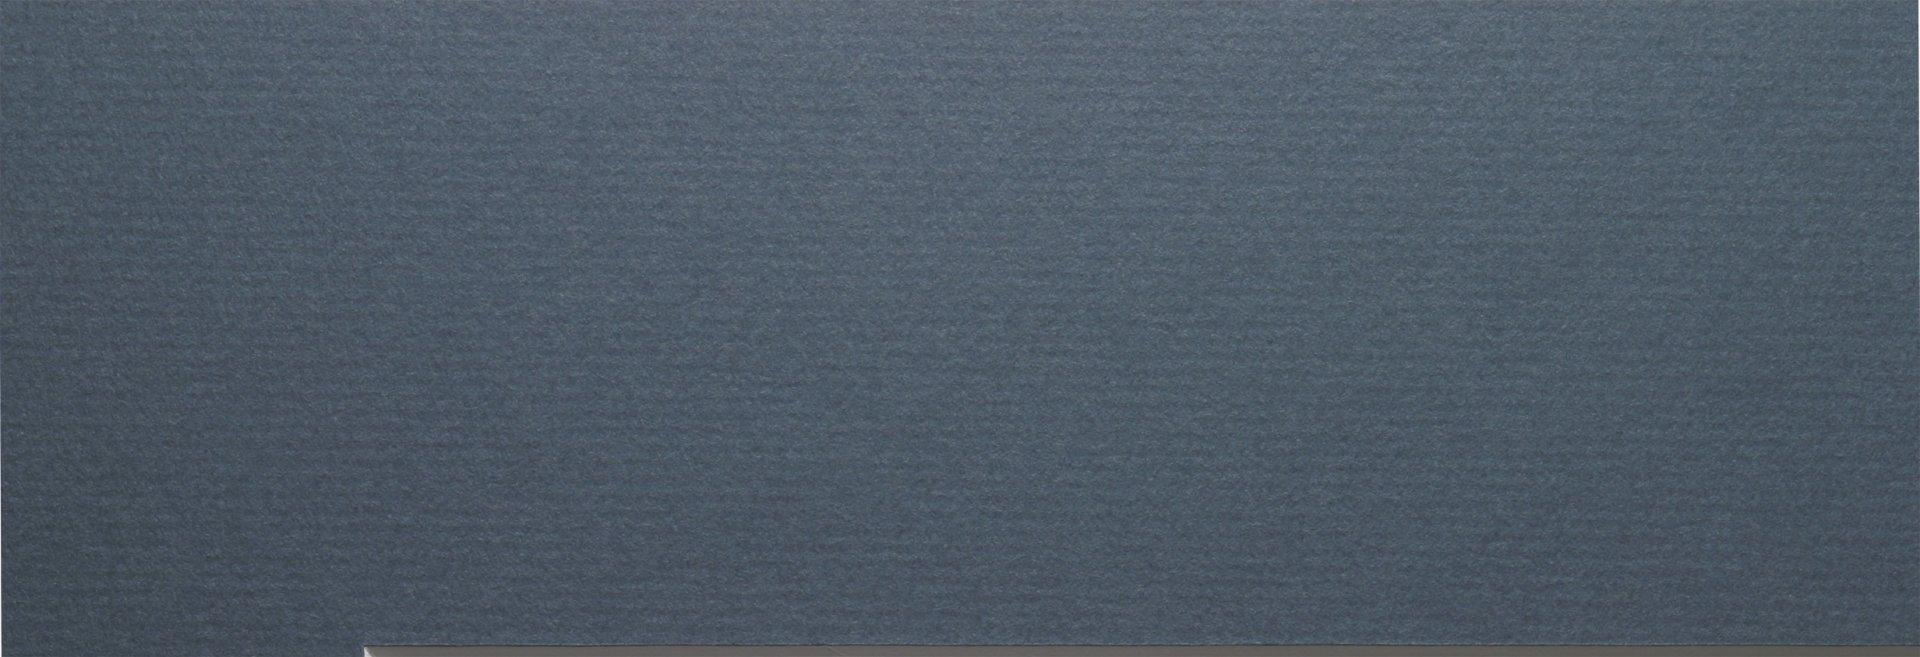 GSRM1054_G1054 Baltic Blue